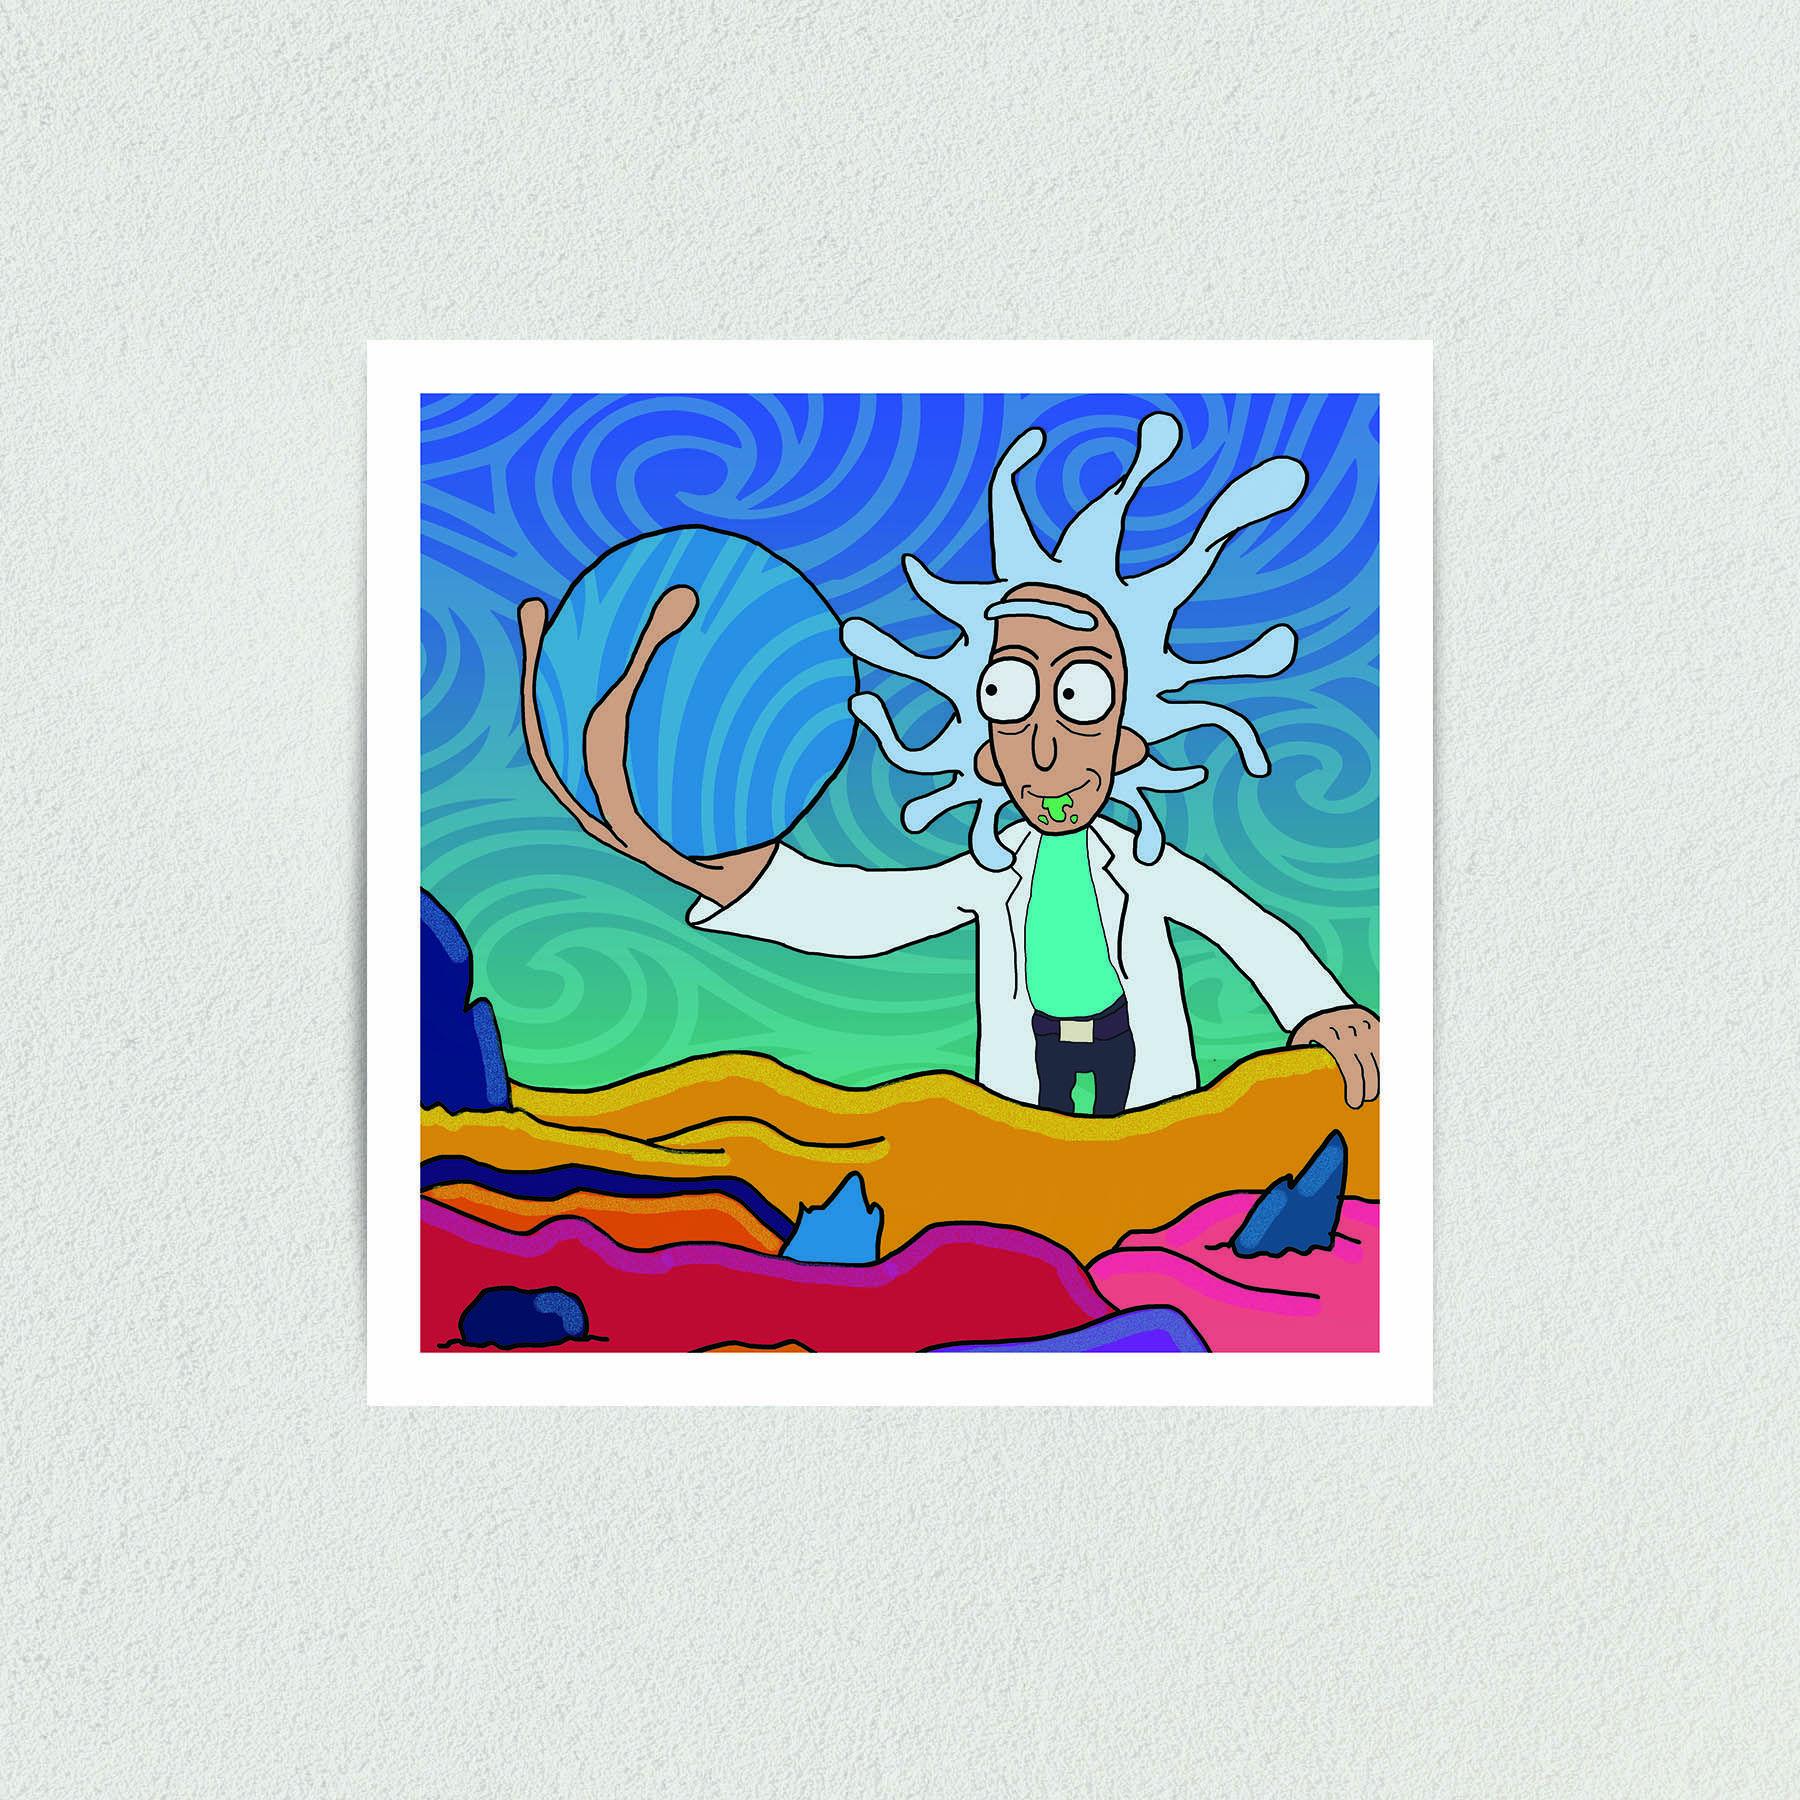 Rick and Morty Art Print Poster 12″ x 12″ Wall Art TV1301